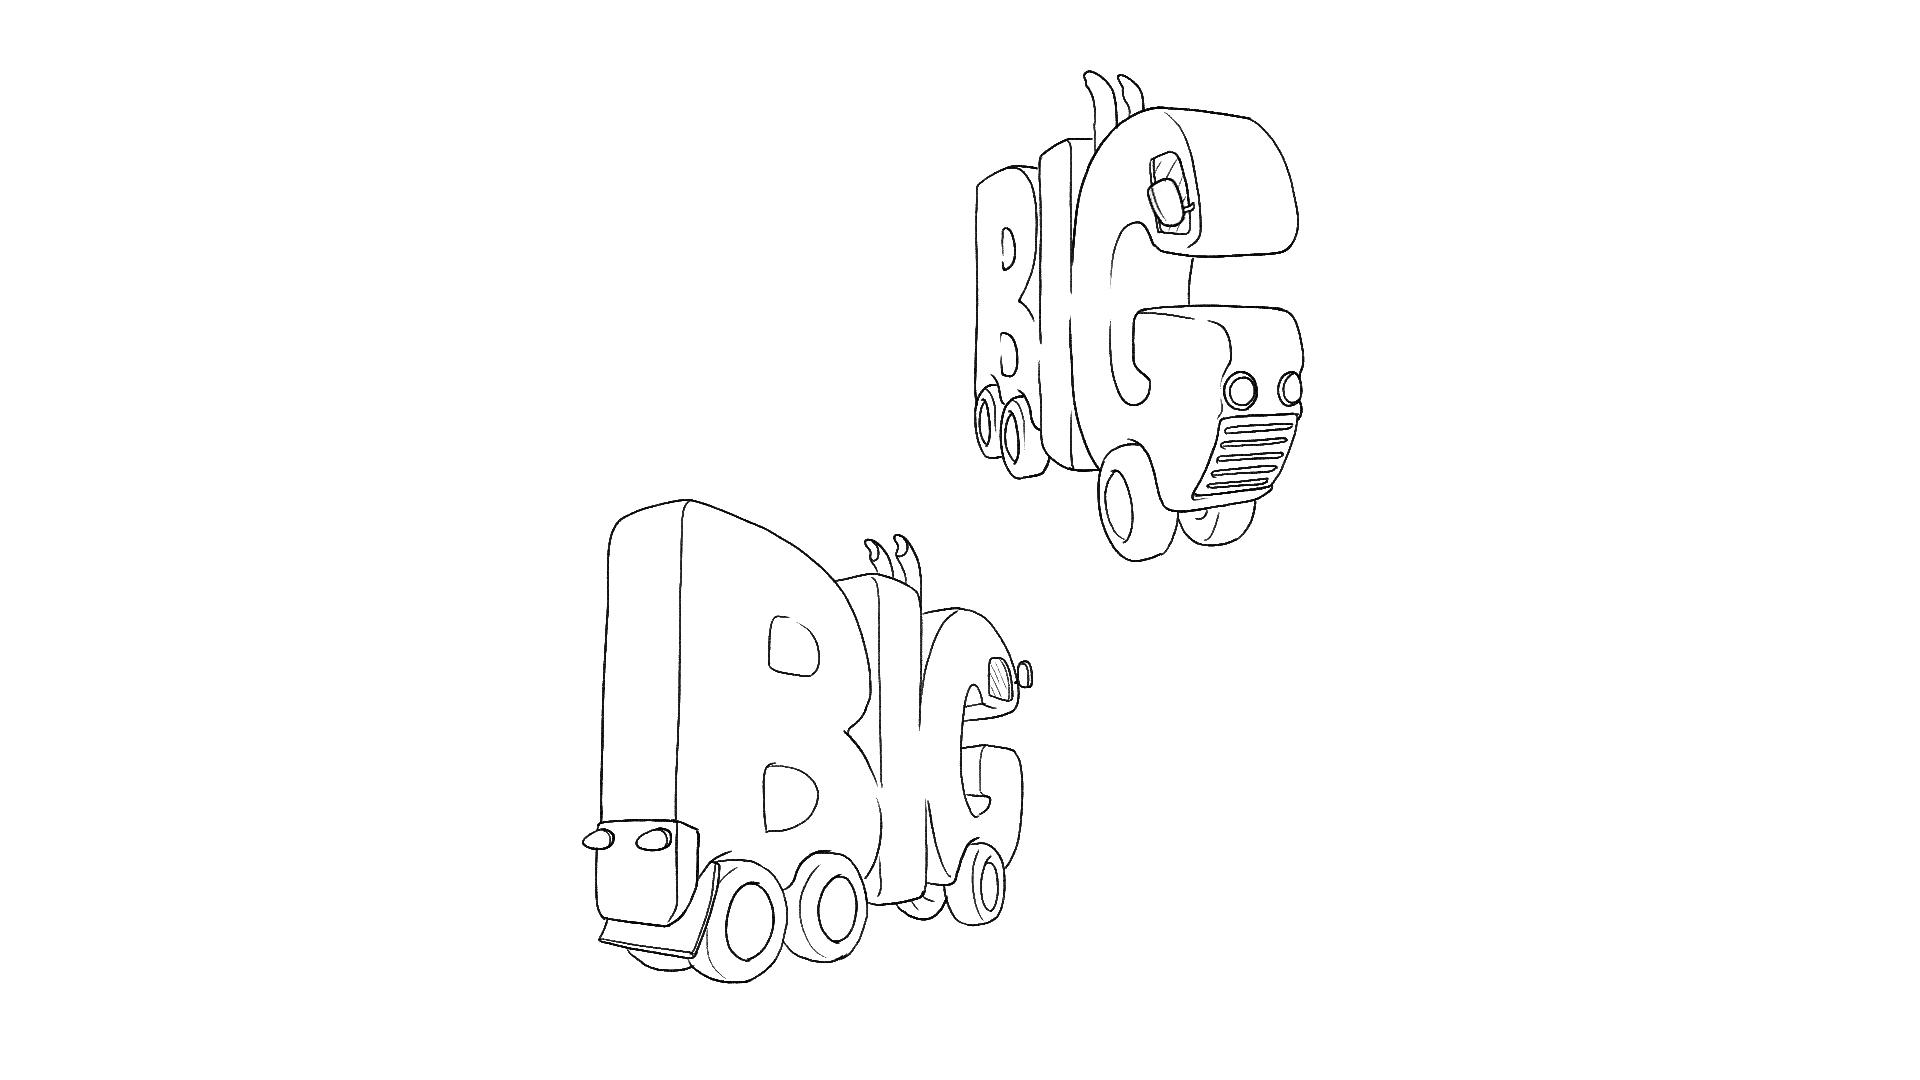 Oreo_HB_BIG_Design_01.jpg